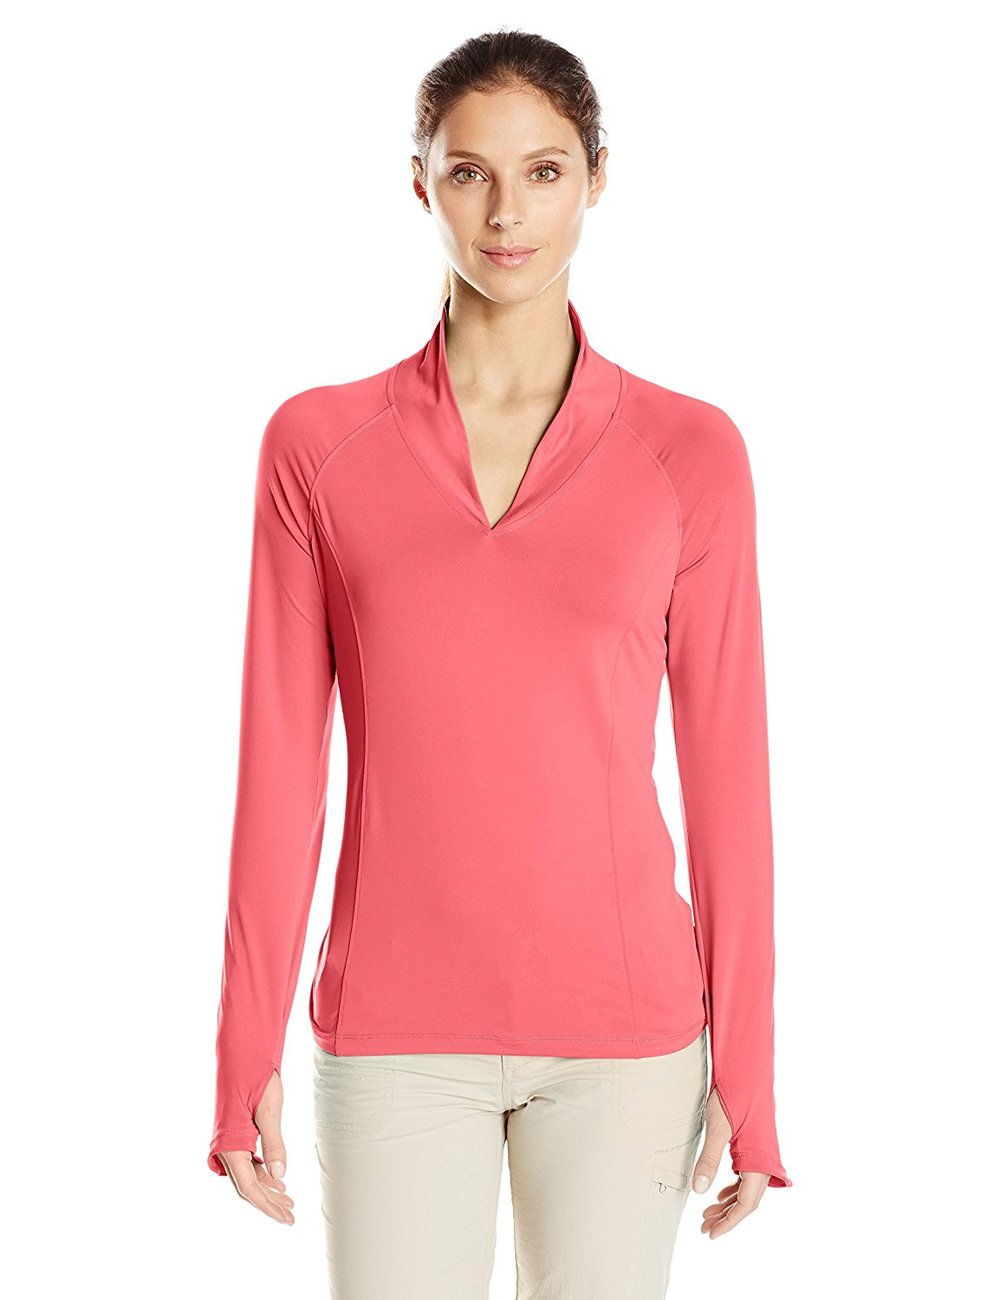 Columbia Women's Freezer III LS Shirt